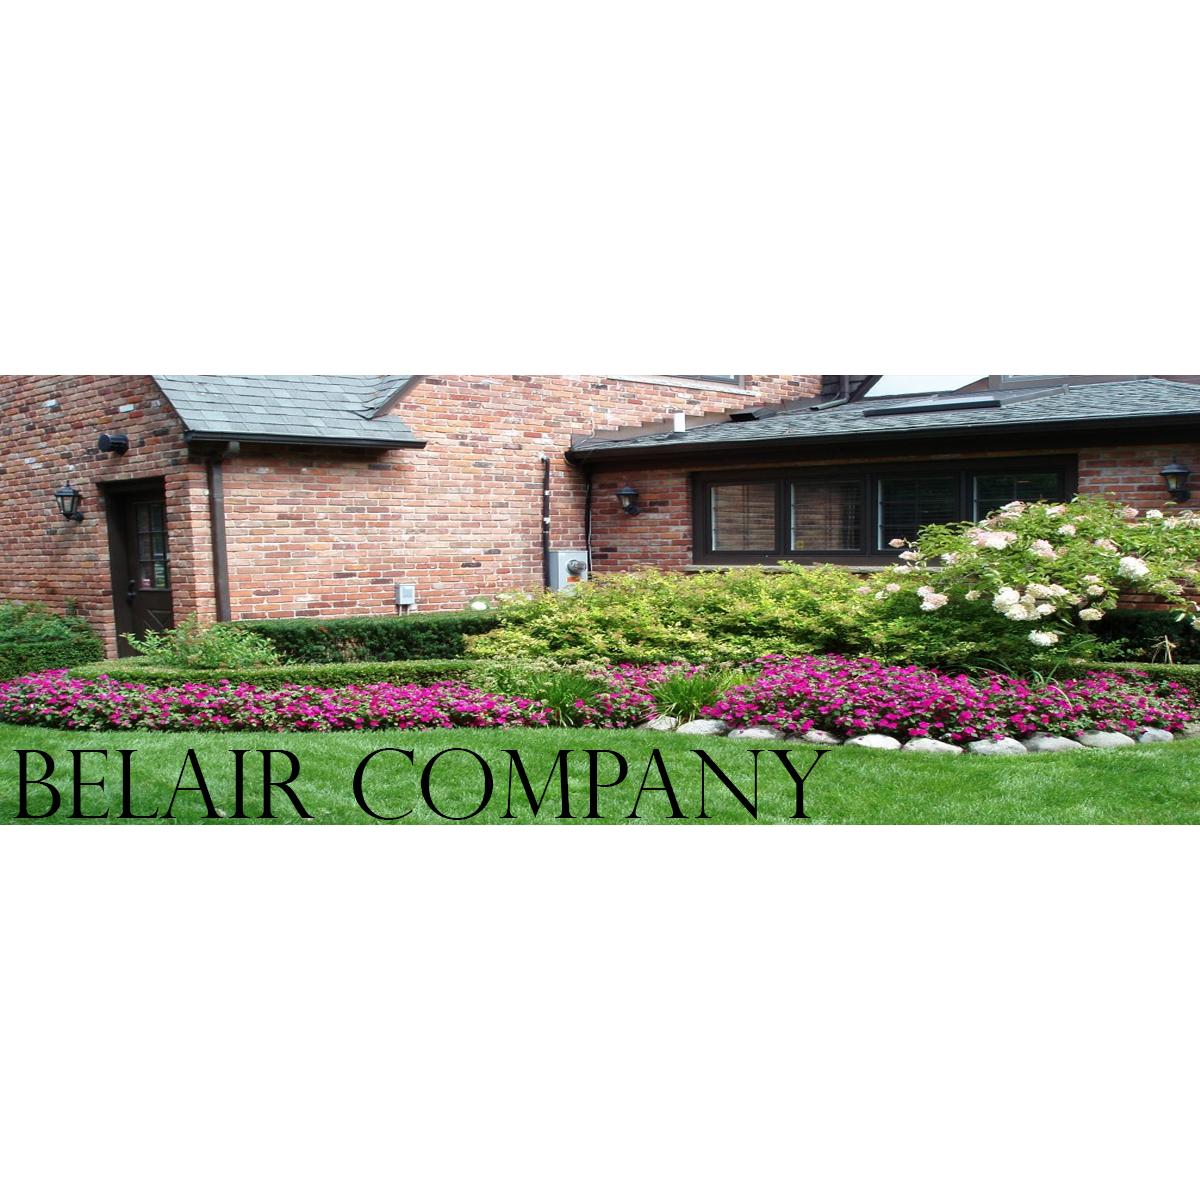 Belair Company LLC